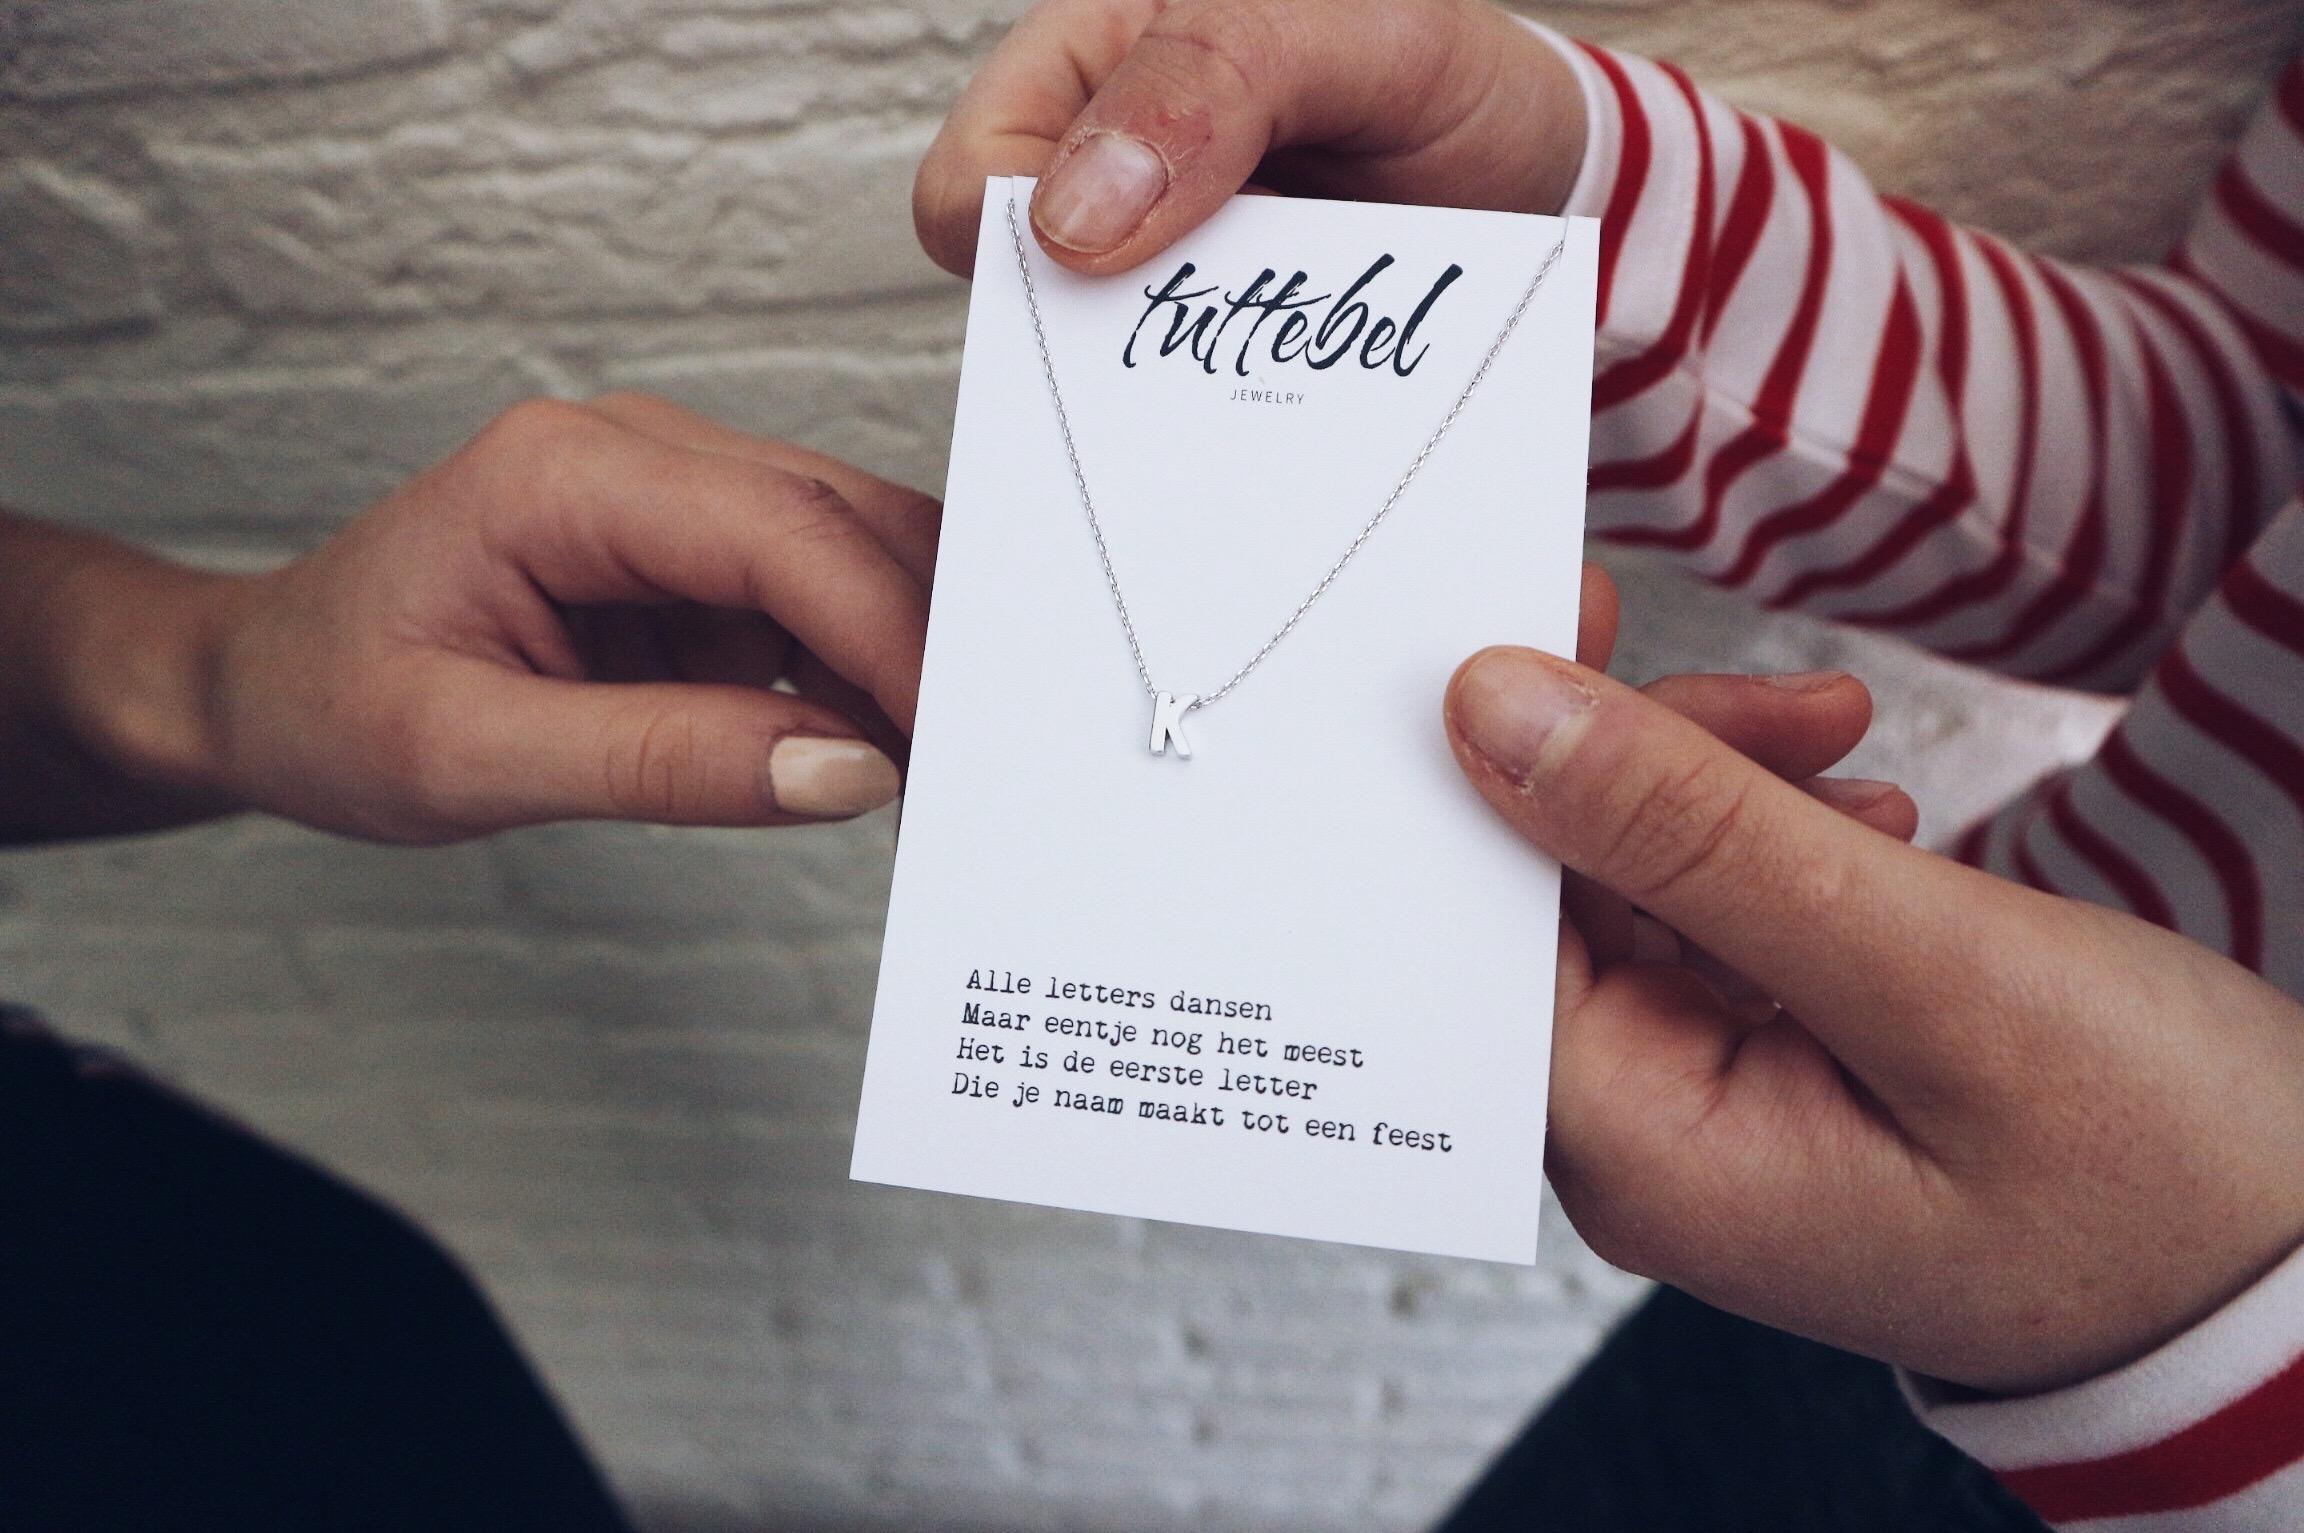 Tuttebel, initial, ketting, necklace, naam, kraamcadeau, bff, bestie, cadeau, cadeautje, naamketting, letter, webshop, xmariekie, blog, blogger